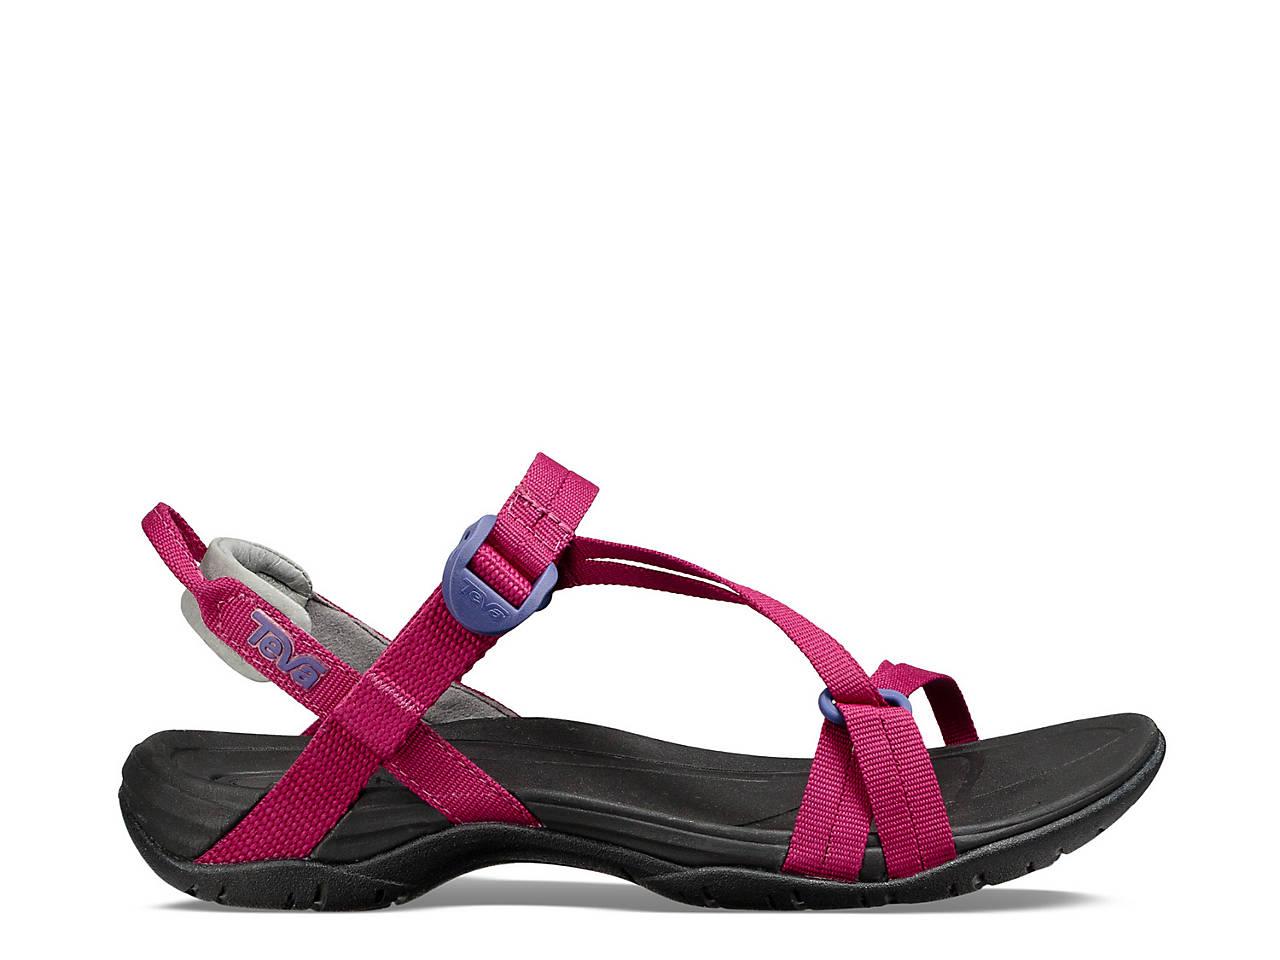 Teva Sirra 4 Casual Sandals